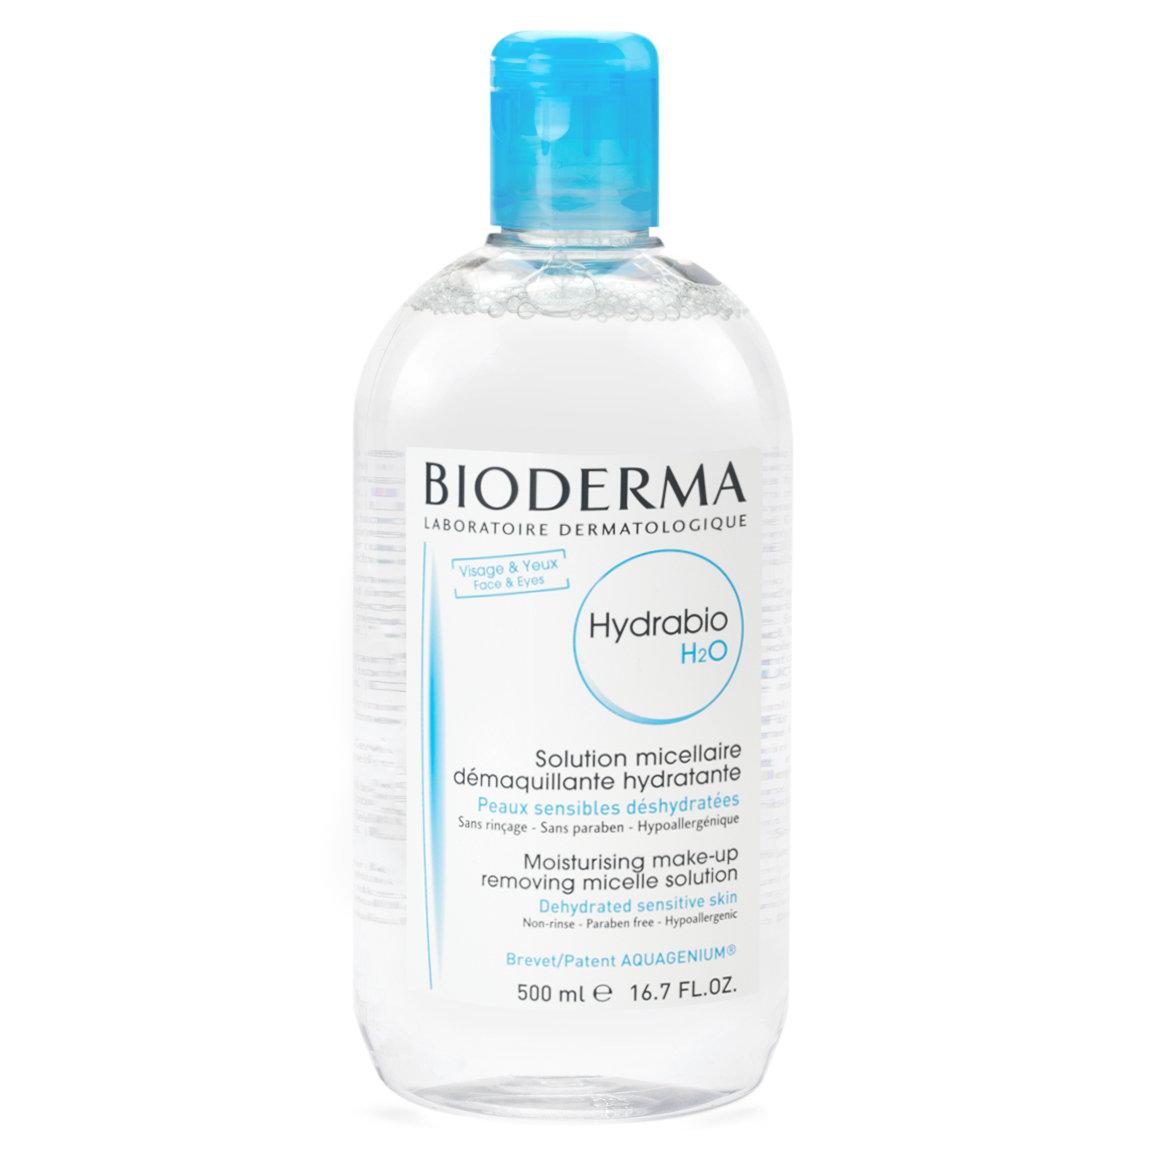 Bioderma Hydrabio H2O